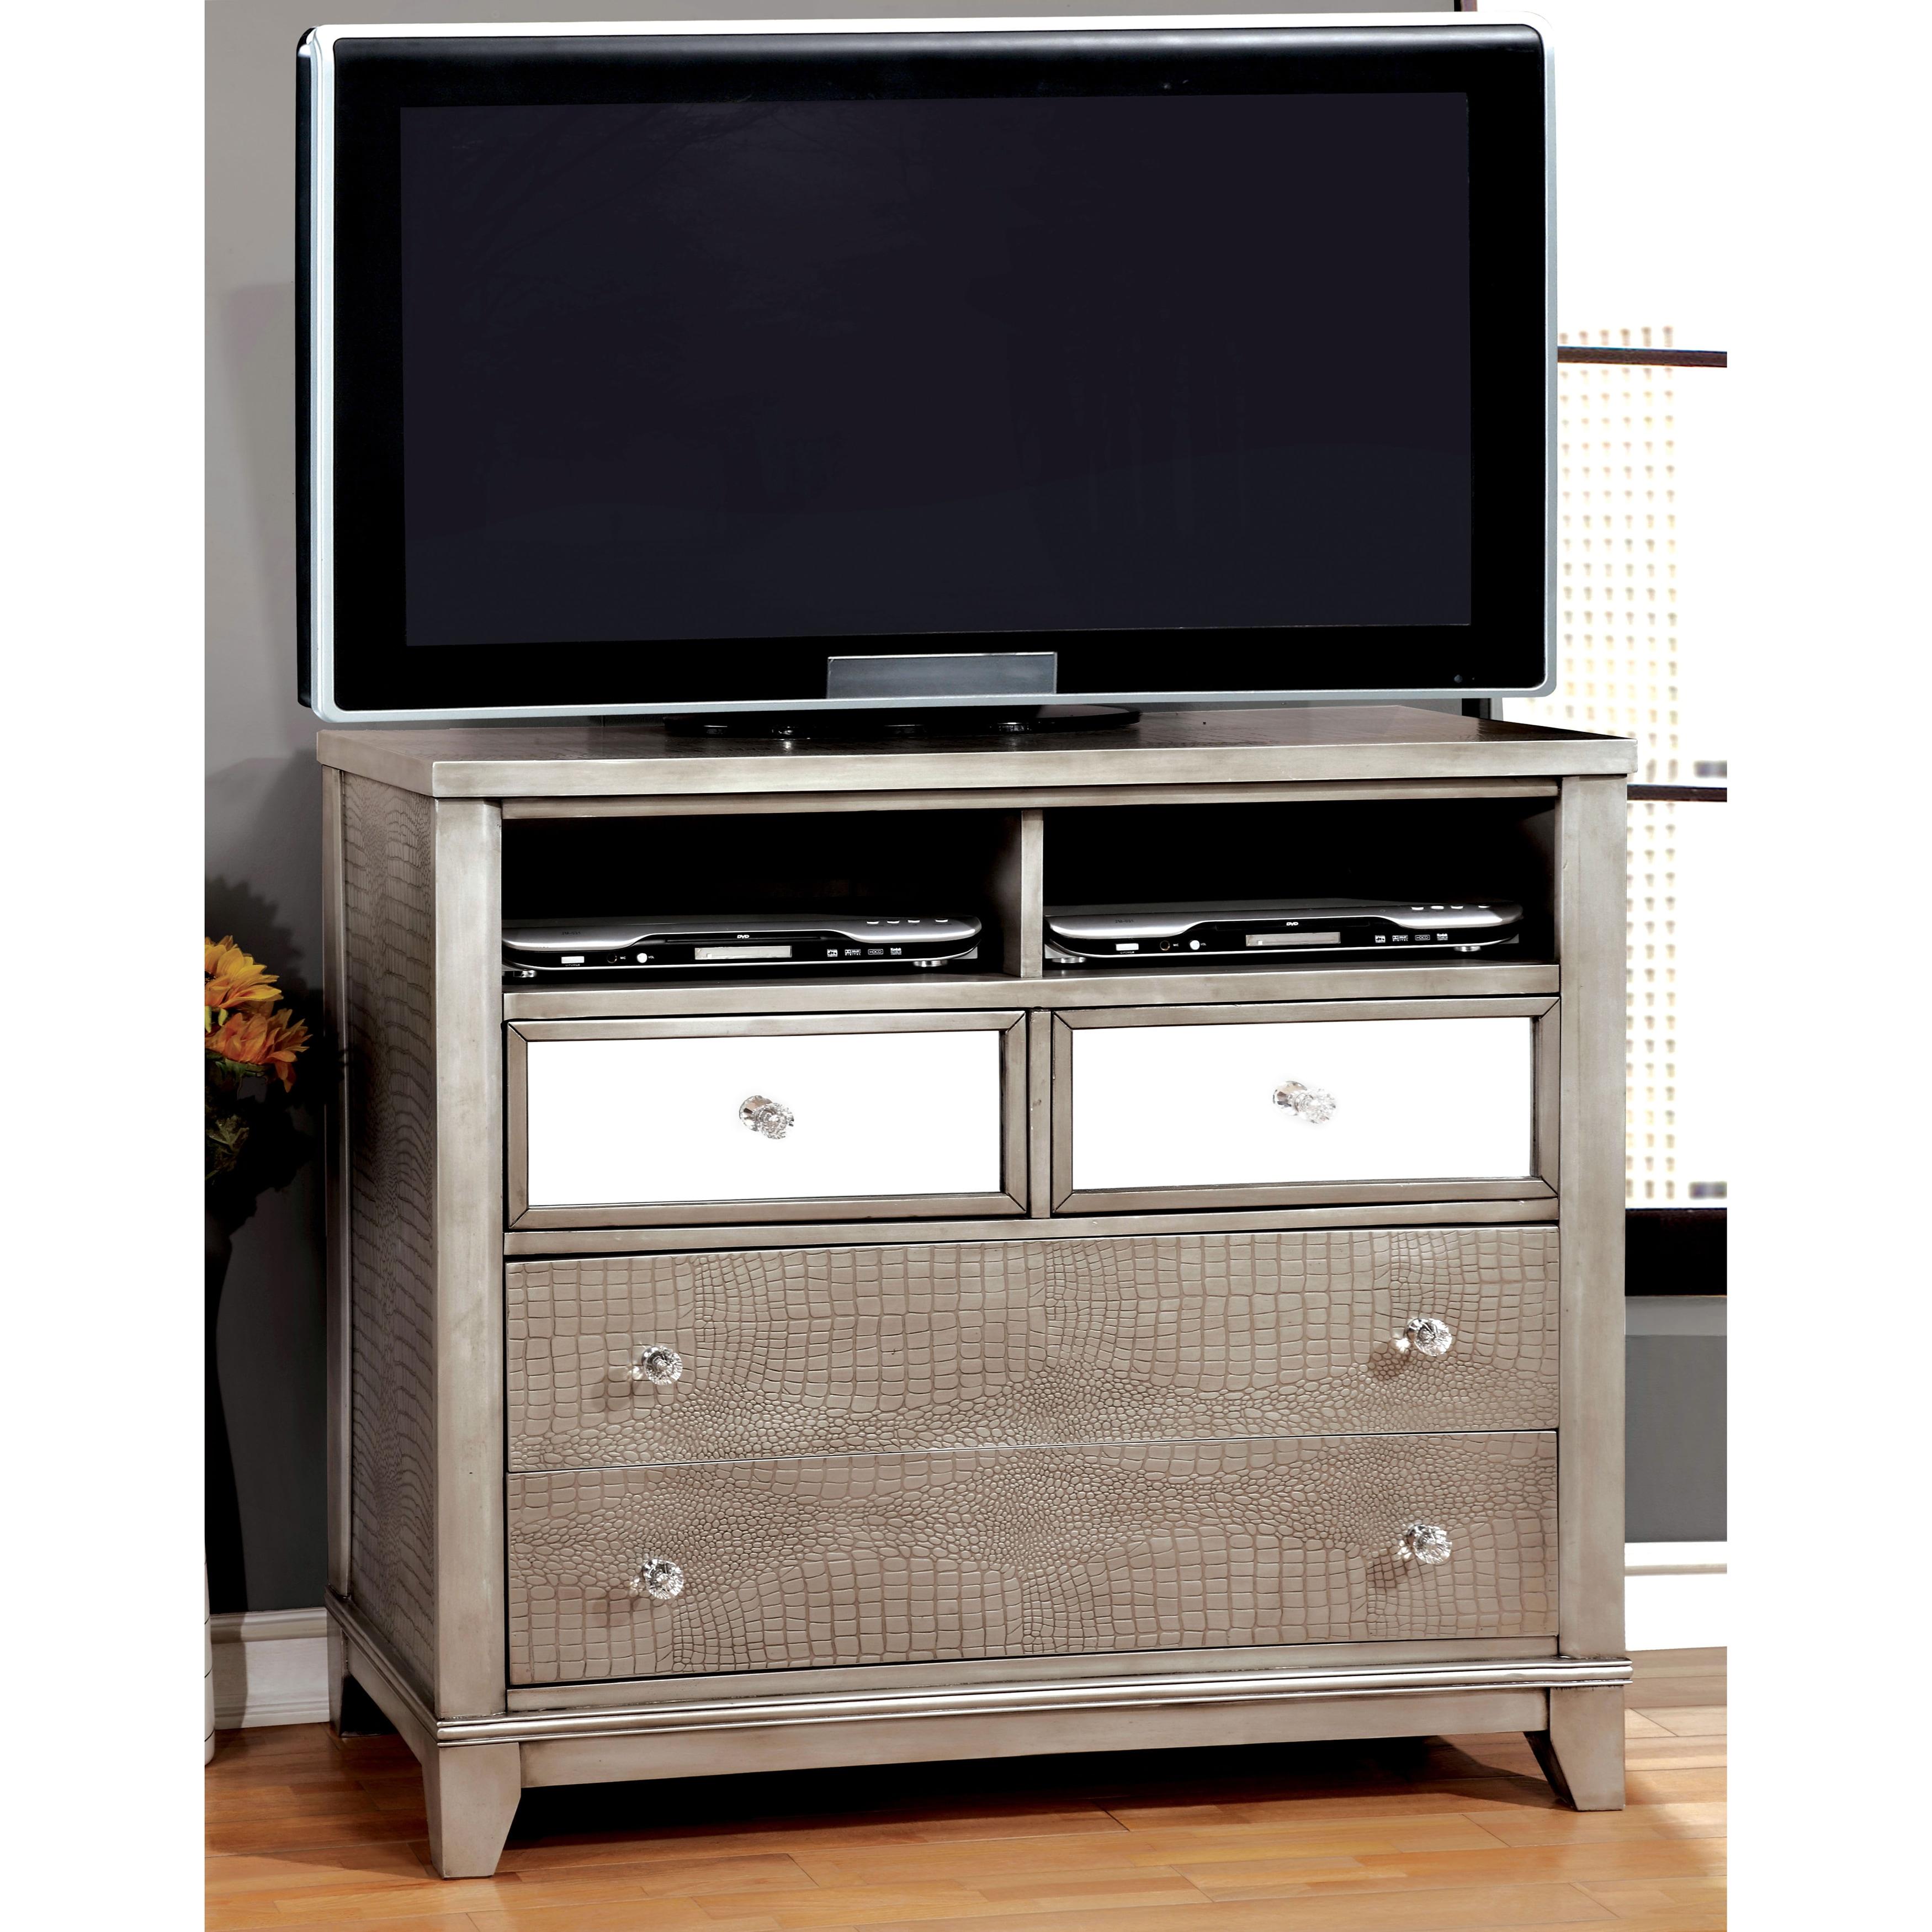 Furniture of America Divonne Modern Crocodile Silver Medi...